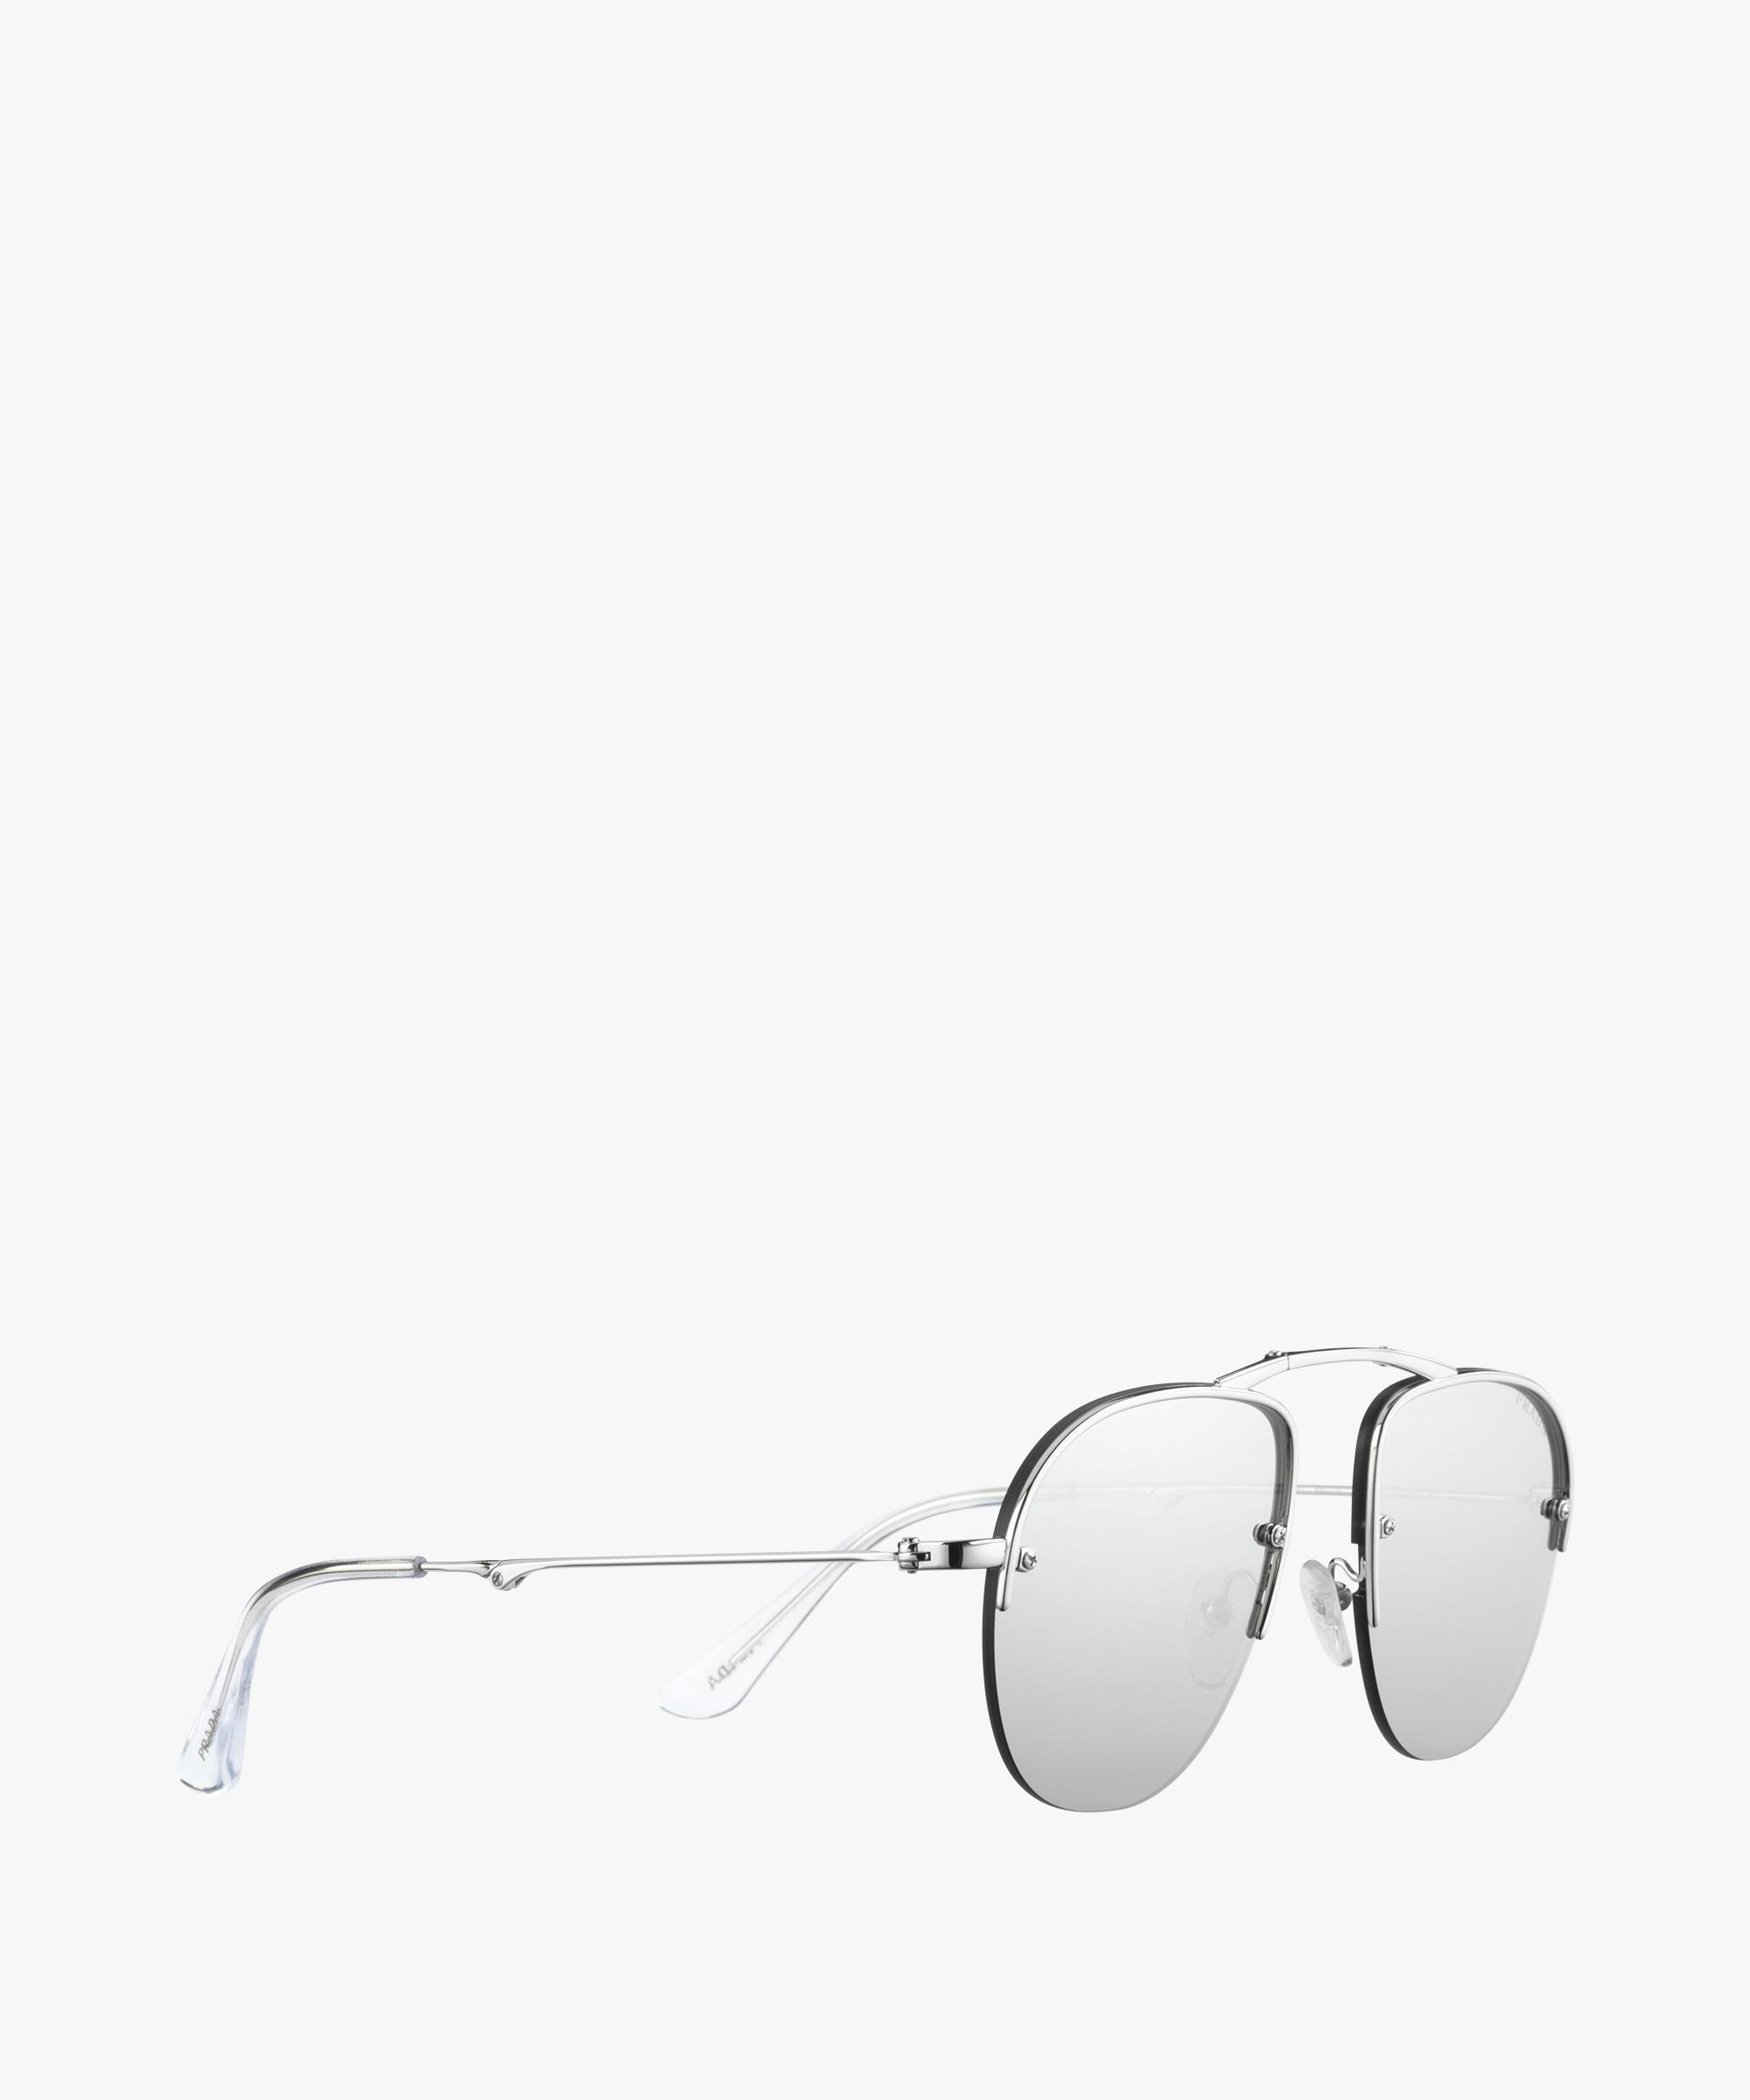 lyst prada teddy eyewear folding in metallic for men  gallery